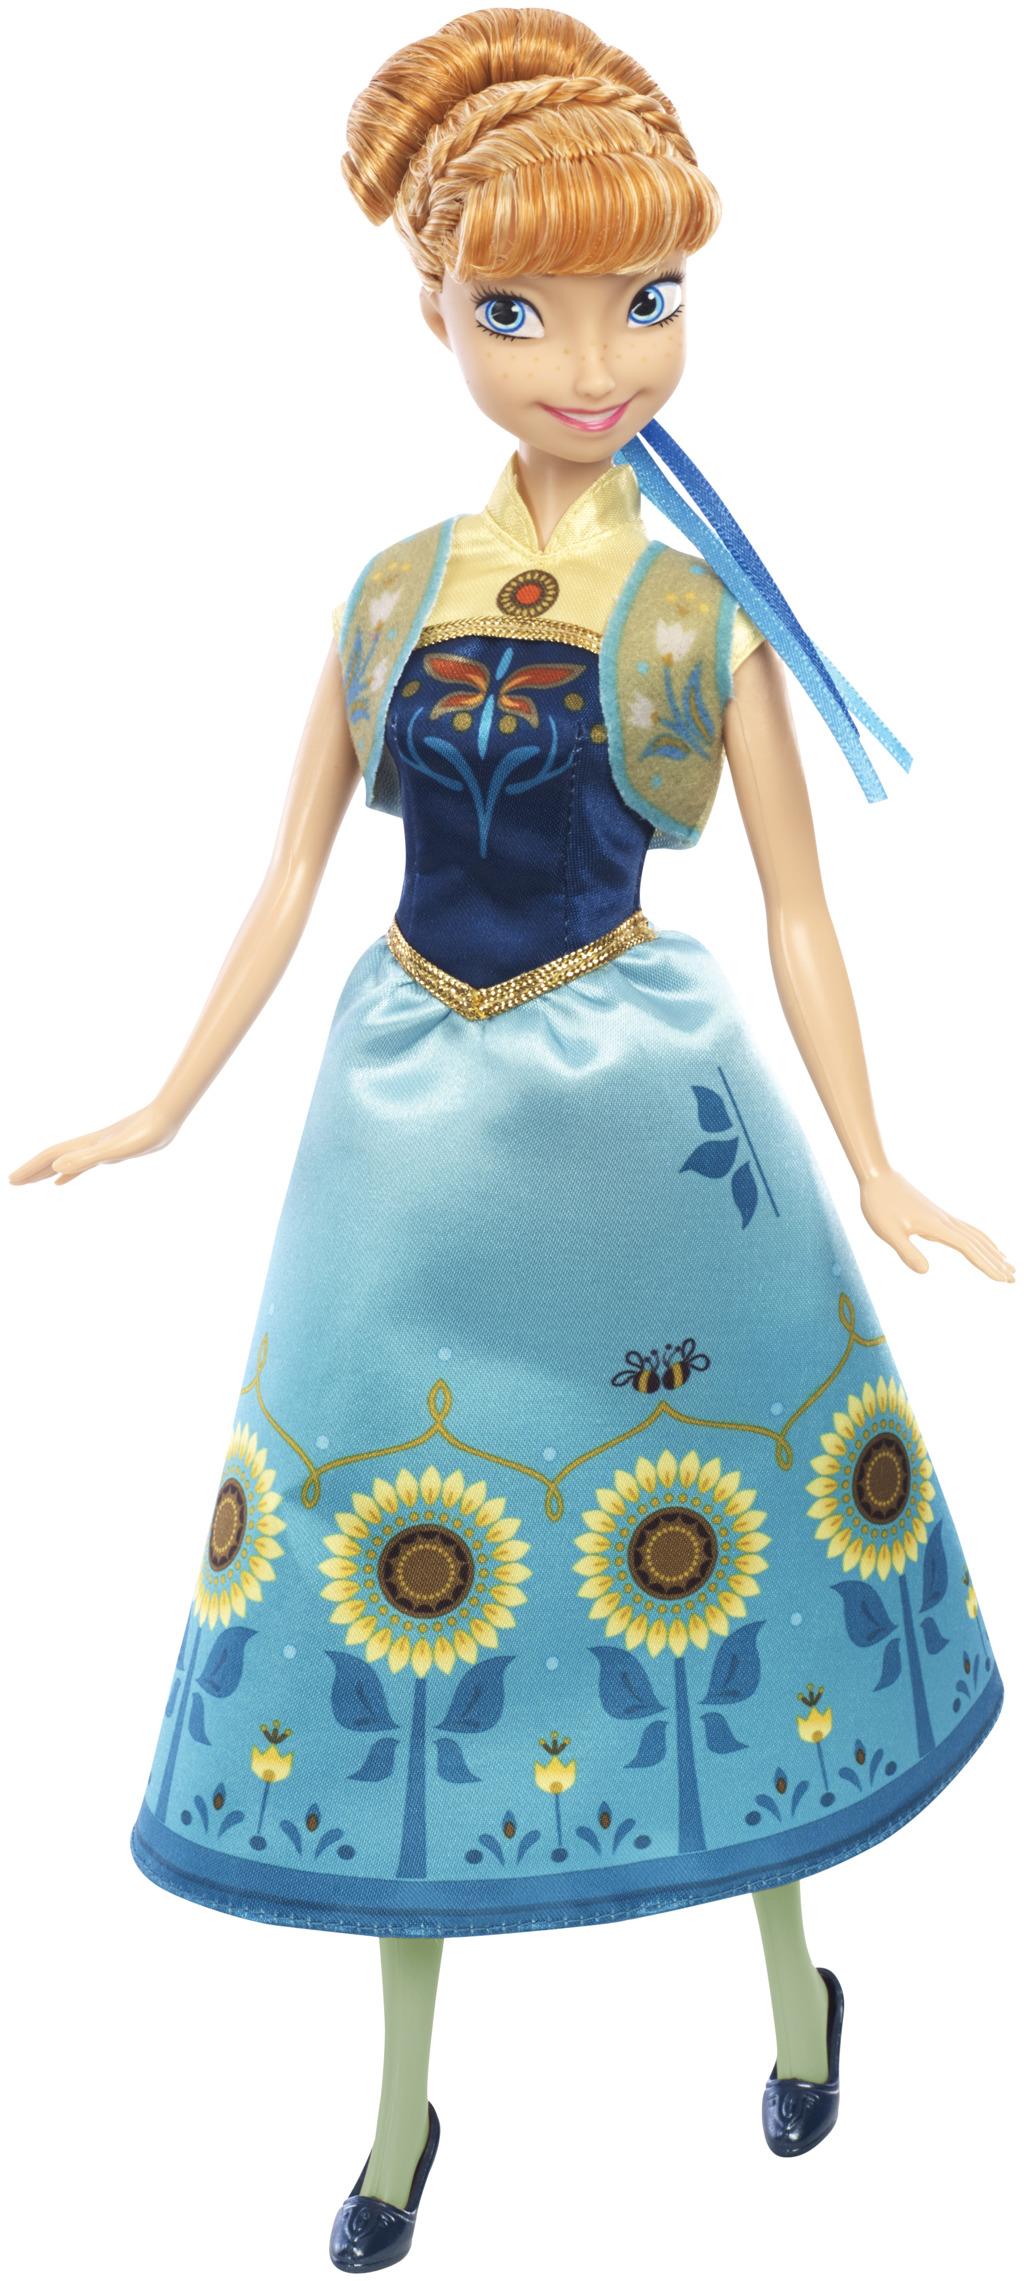 Mattel Disney narozeninová oslava princezna: Anna